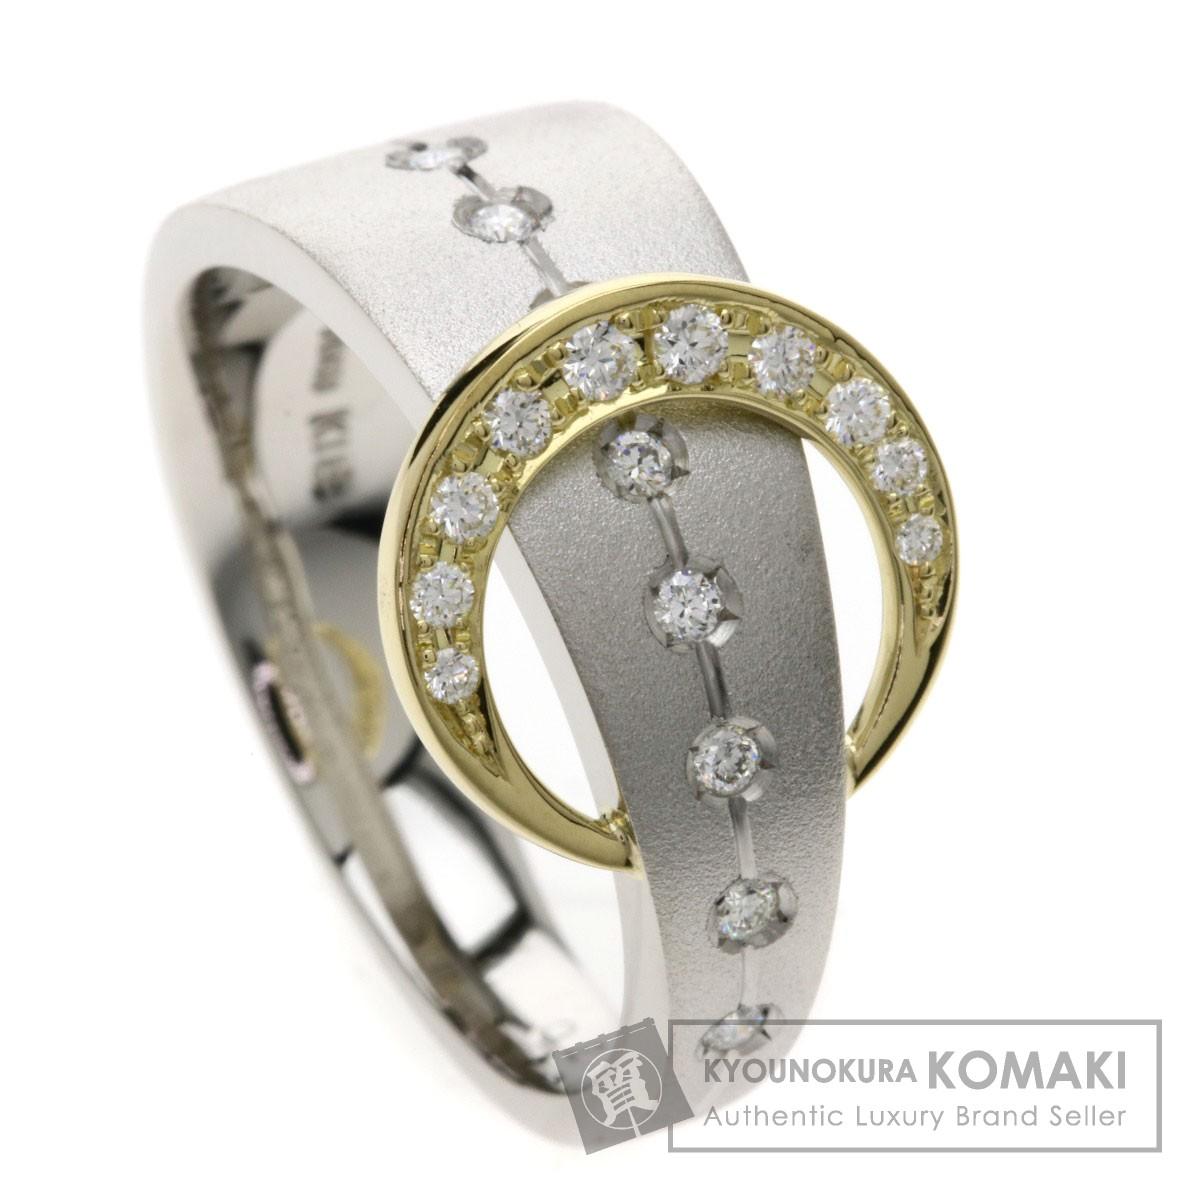 0.21ct ダイヤモンド リング・指輪 プラチナPT900/K18YG 9.3g レディース 【中古】